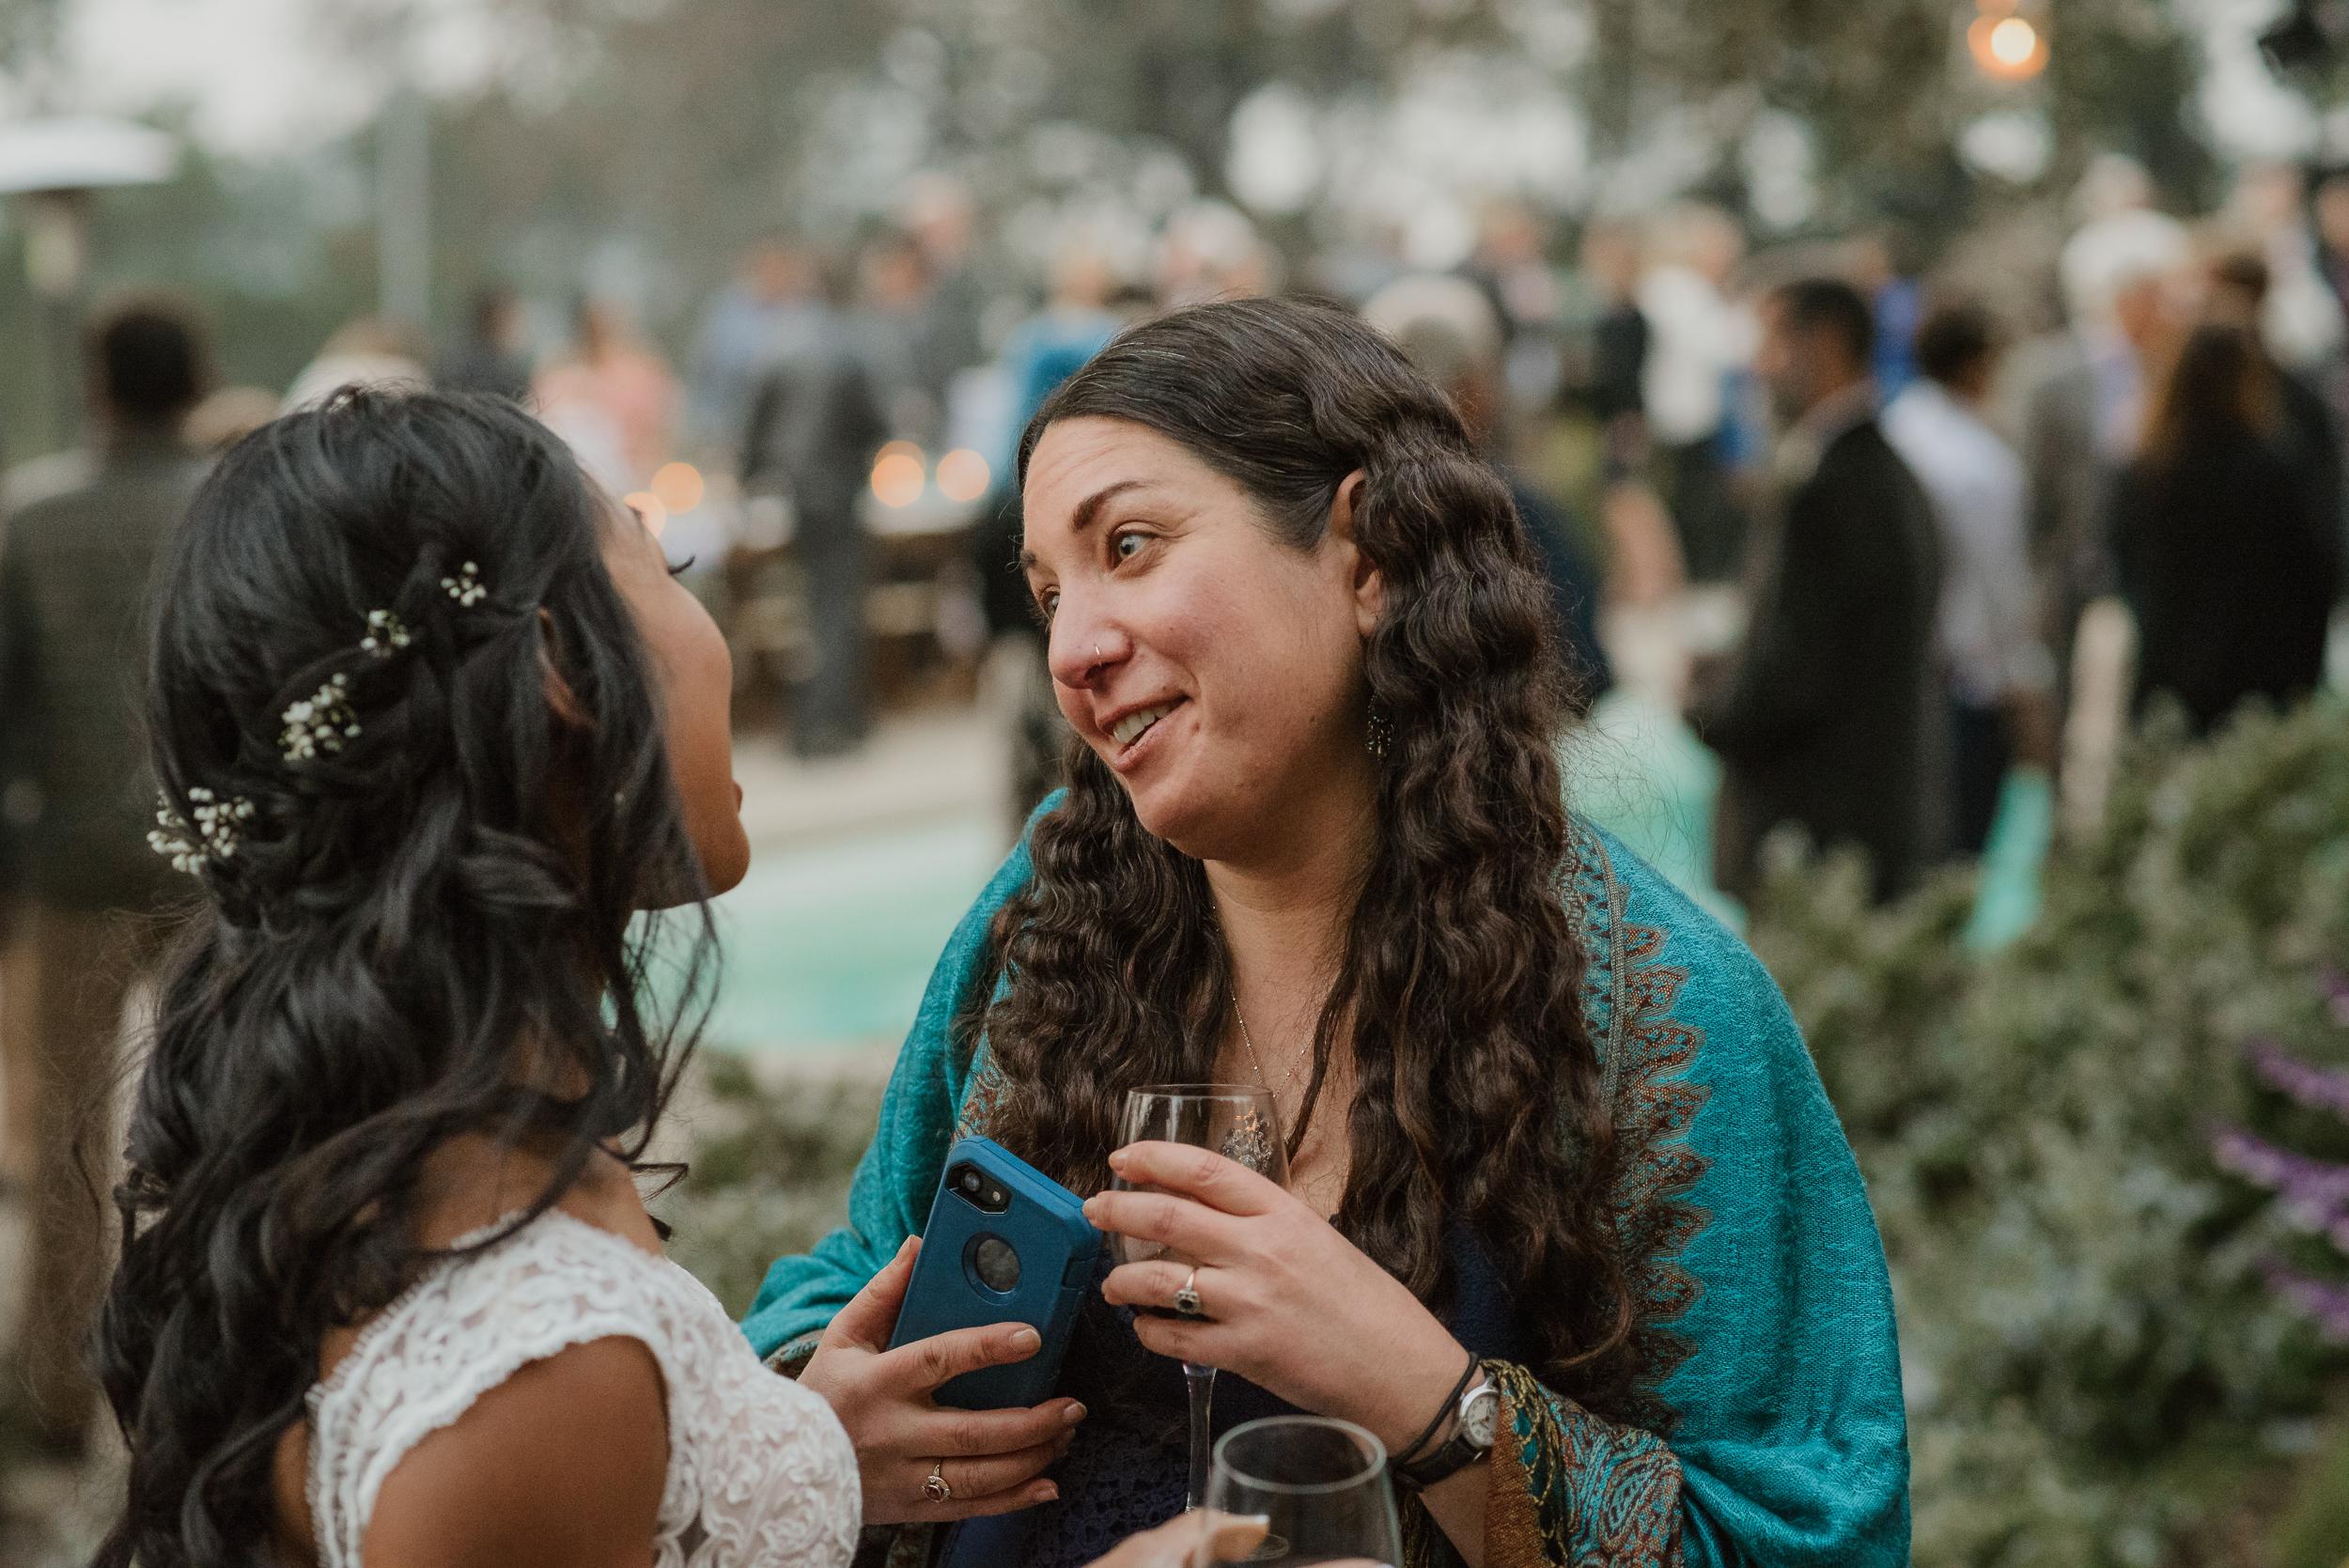 093marin-petaluma-backyard-wedding-vivianchen-571.jpg